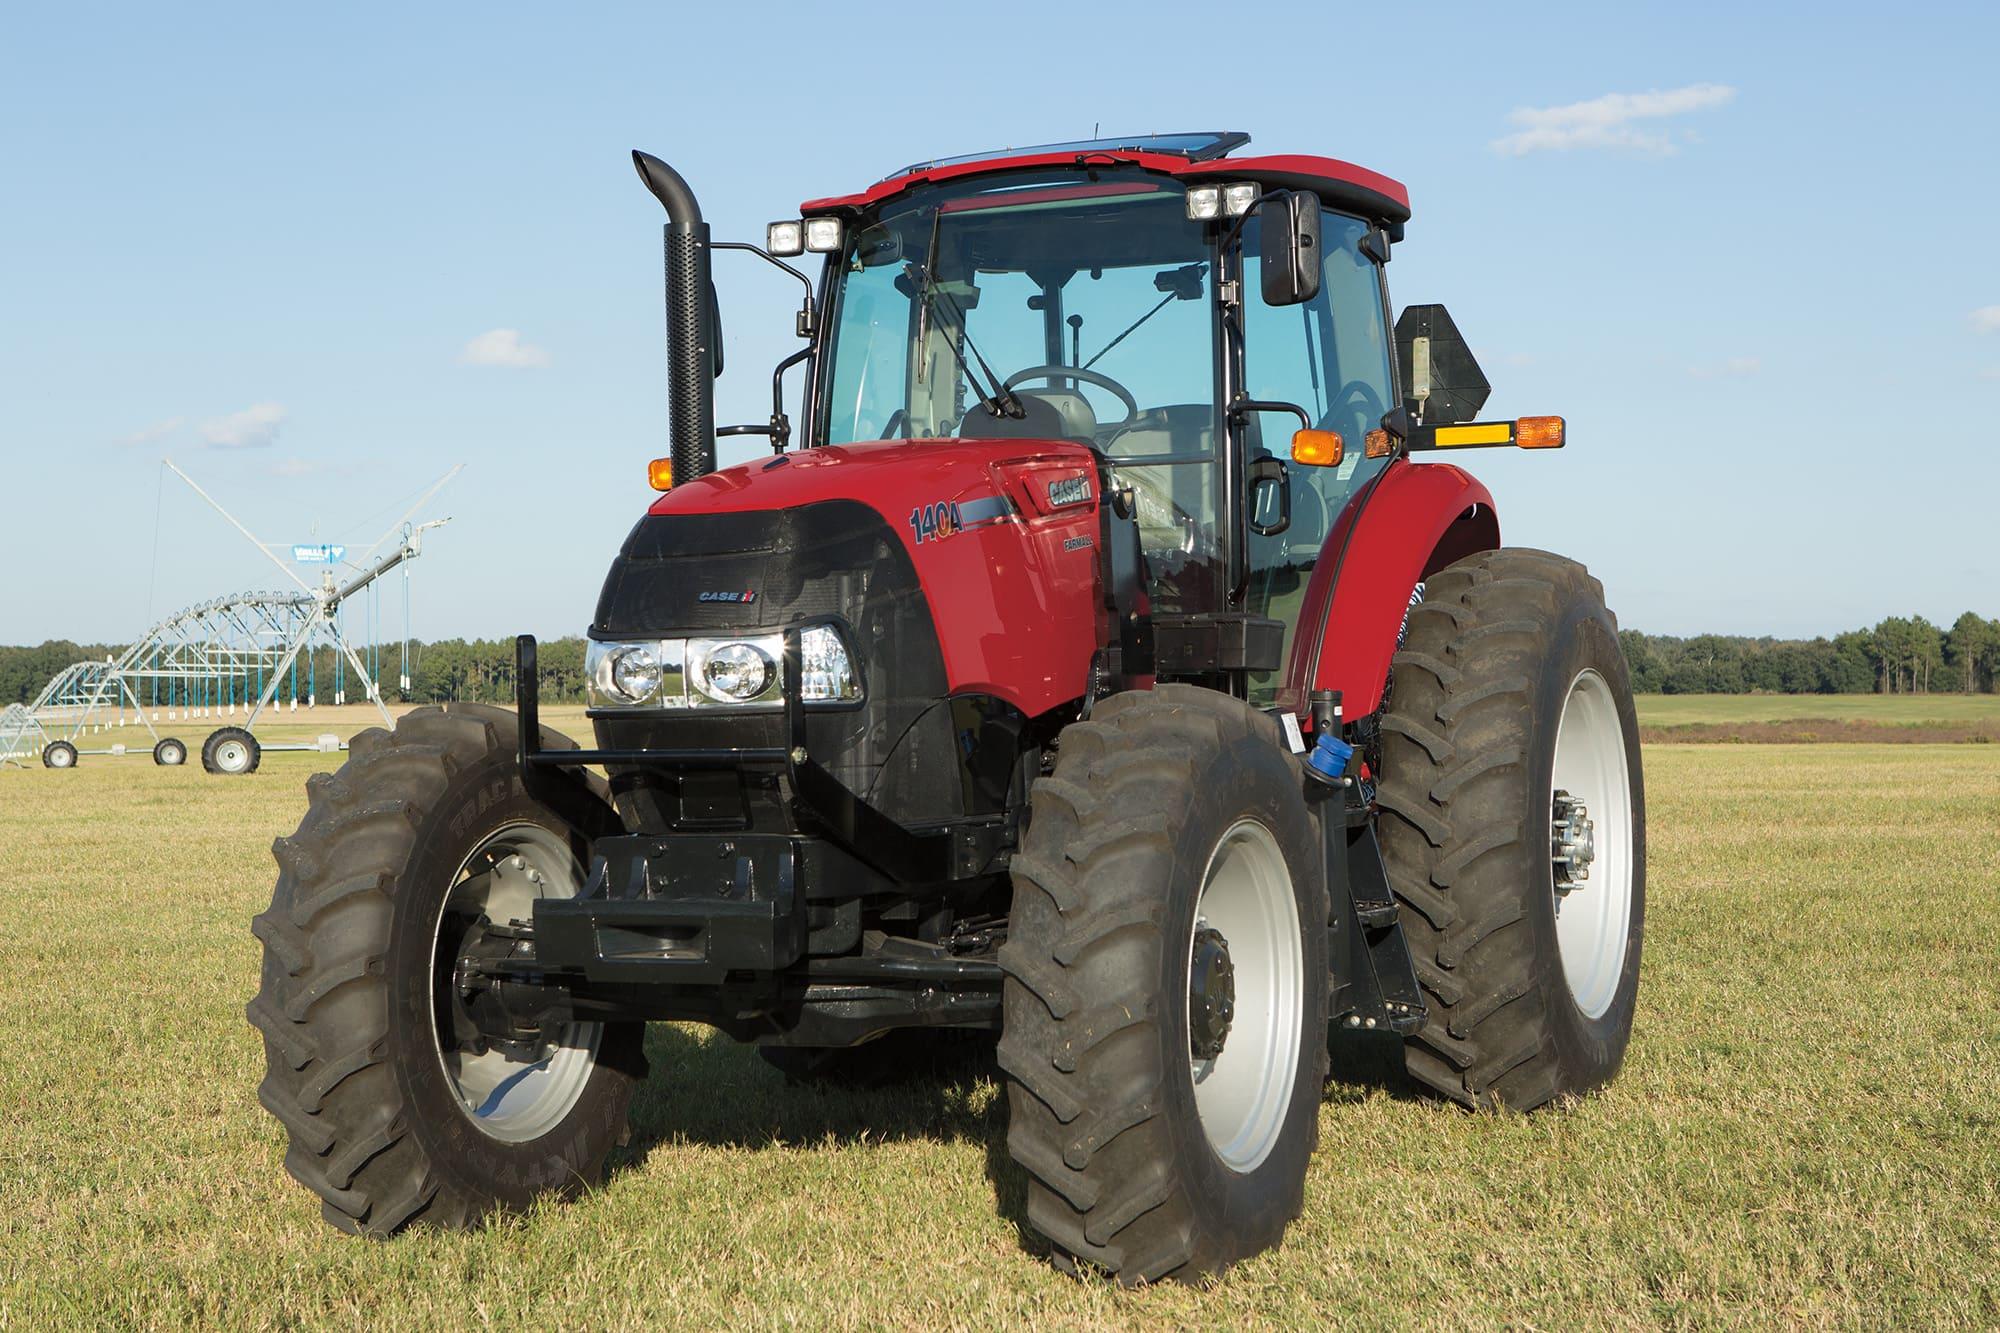 Farmall 140a Compact Utility Tractors Case Ih 140 Wiring Diagram